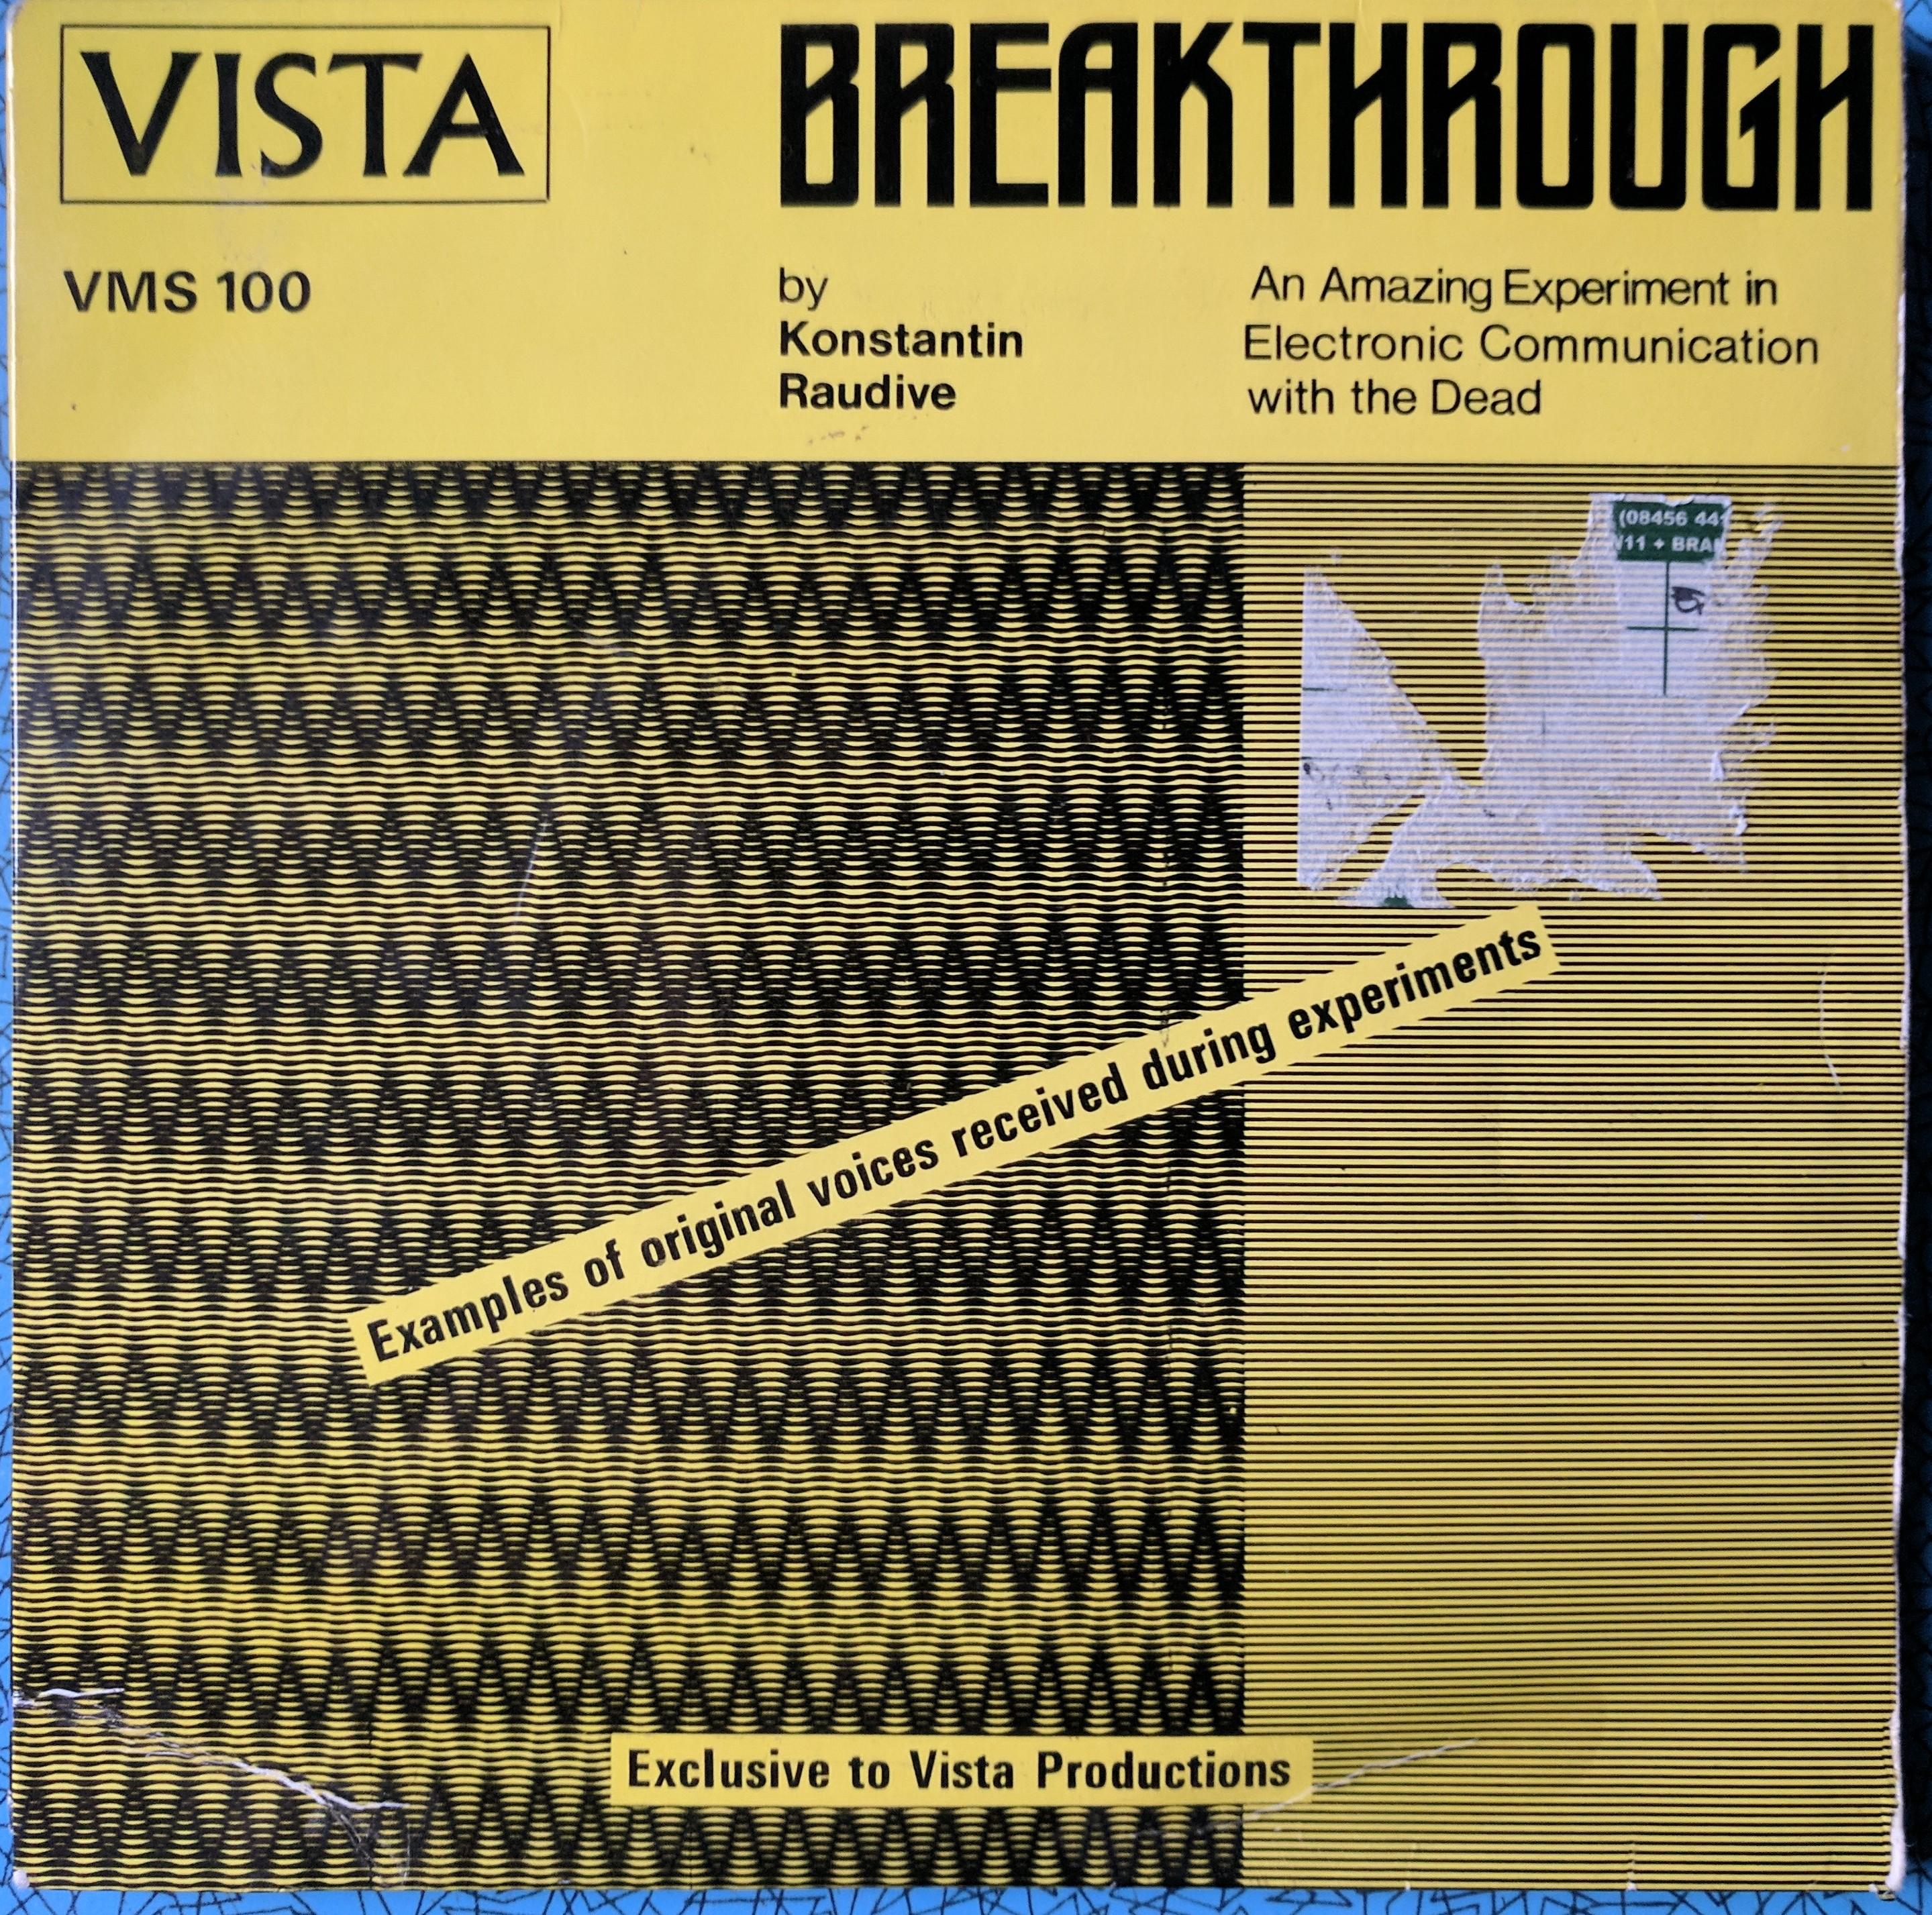 Breakthrough EVP Side A